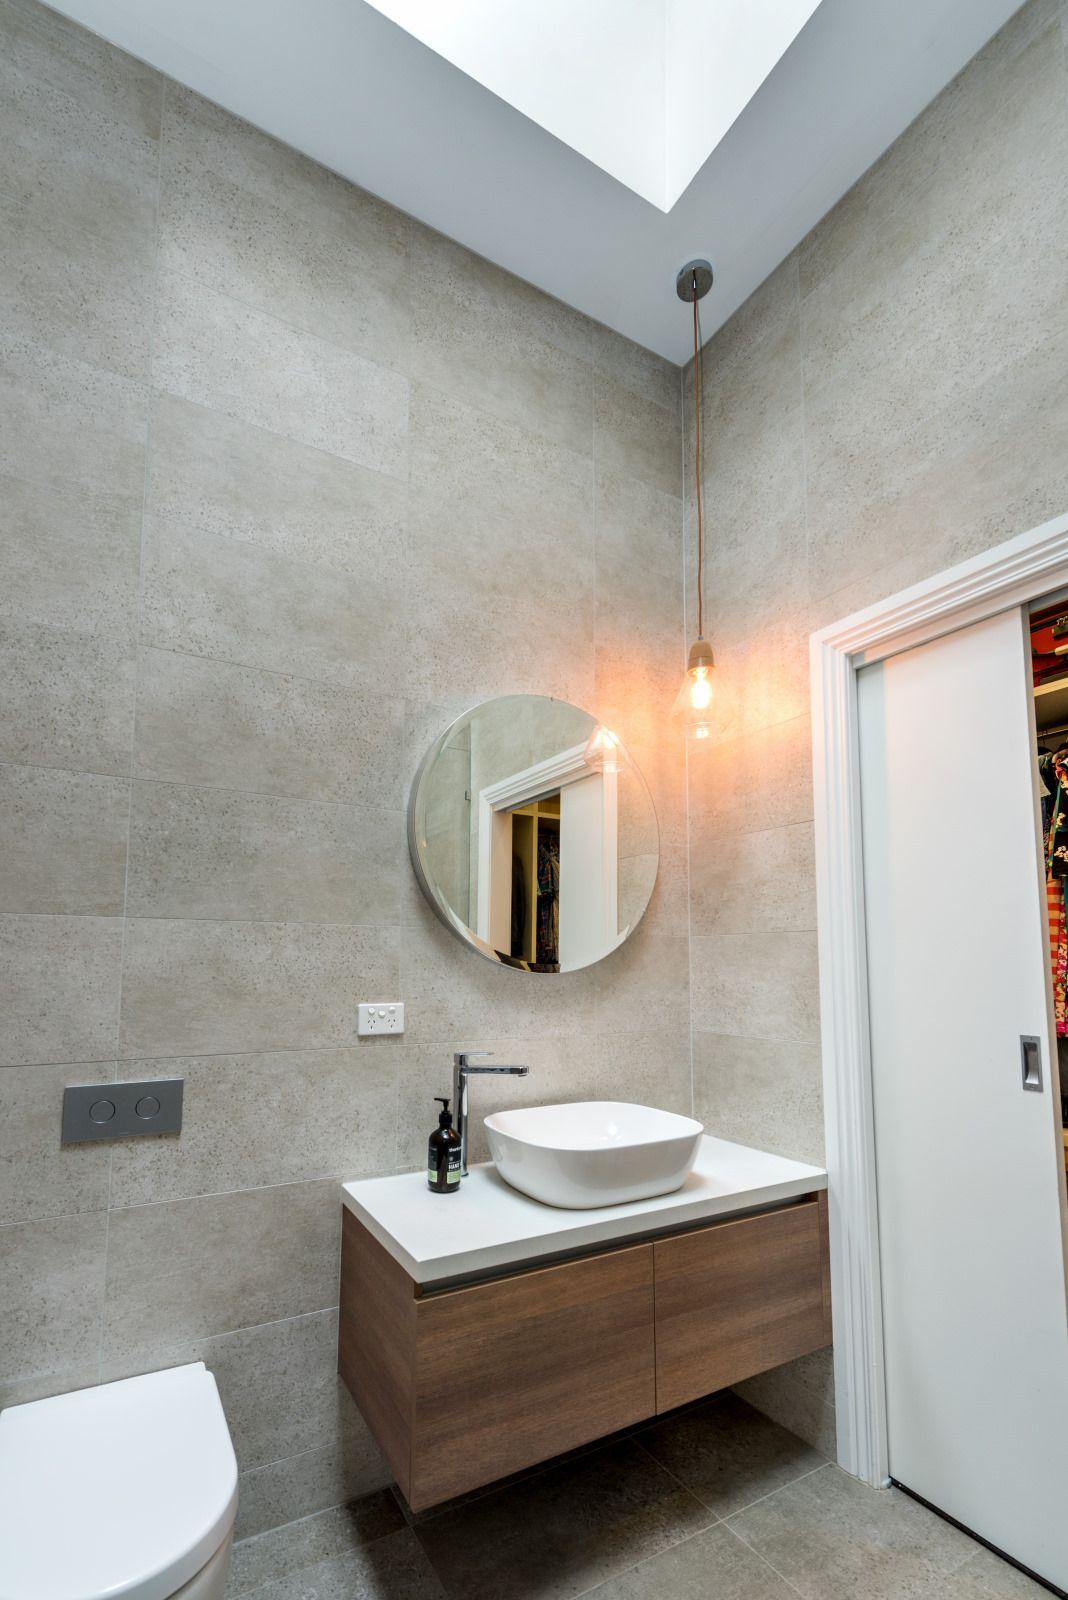 Pin By Rani Sankar On Interiors In 2019 Bathroom Lighting